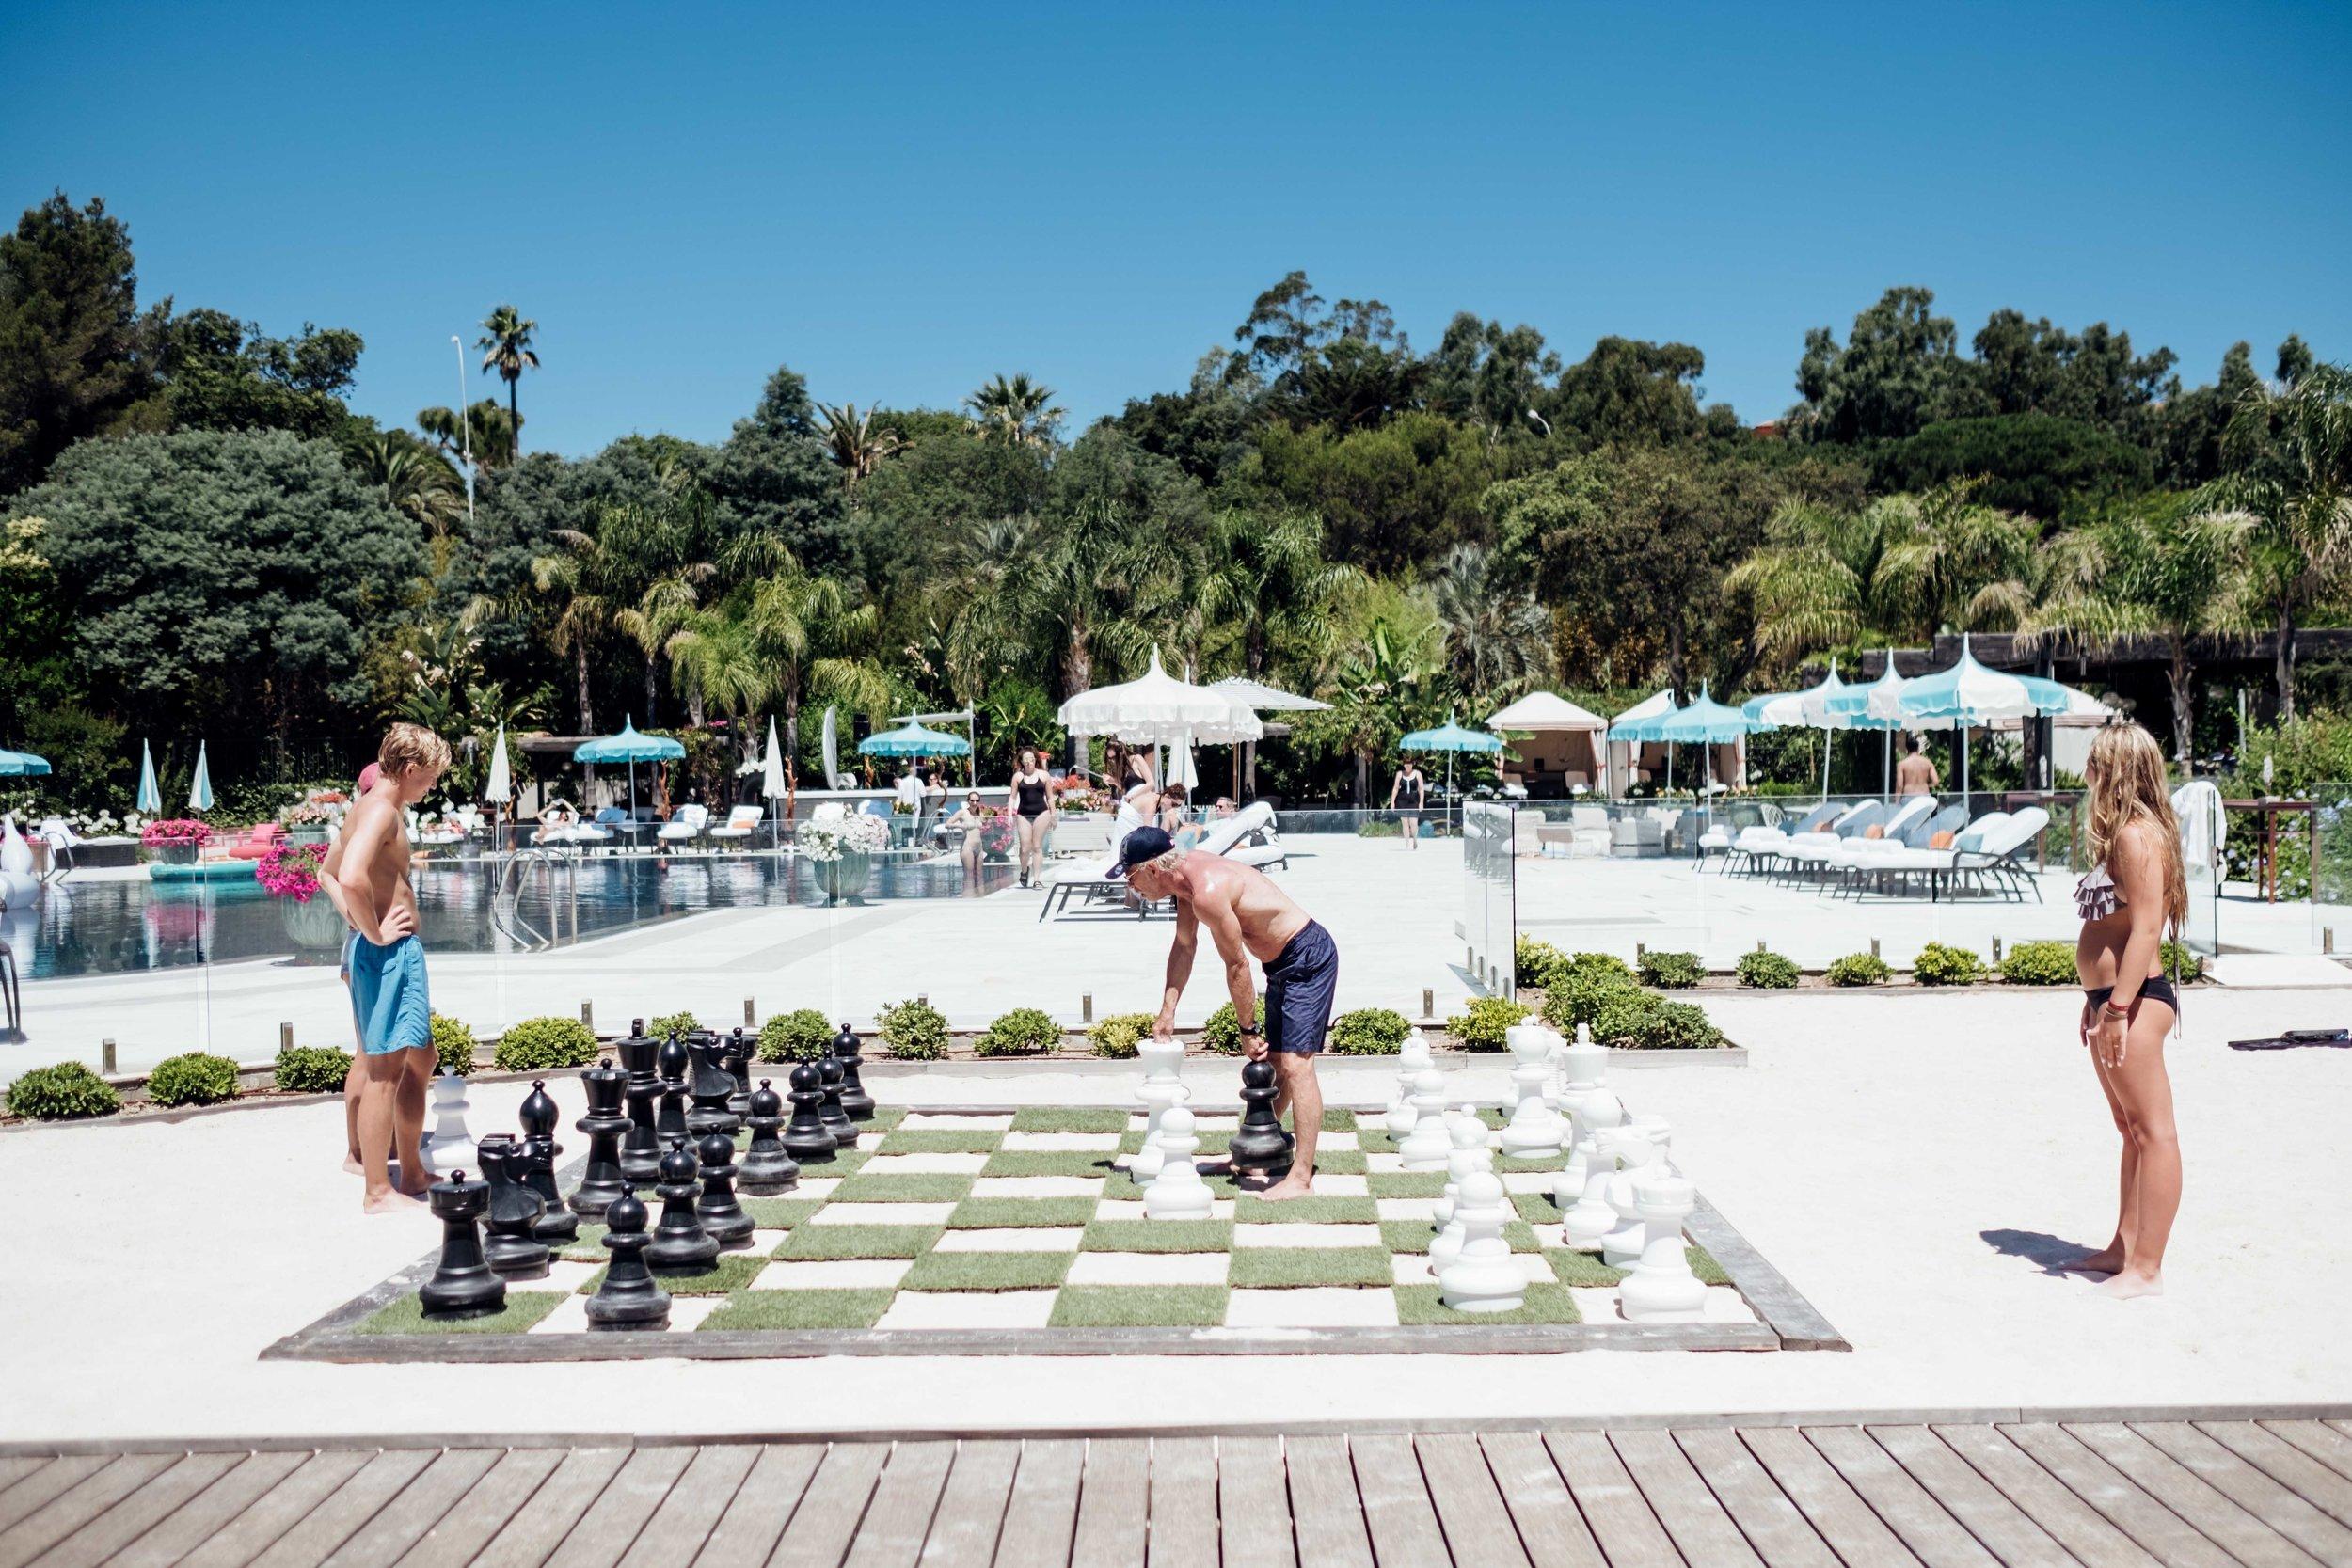 Le Beauvallon Poolside Chess.jpg